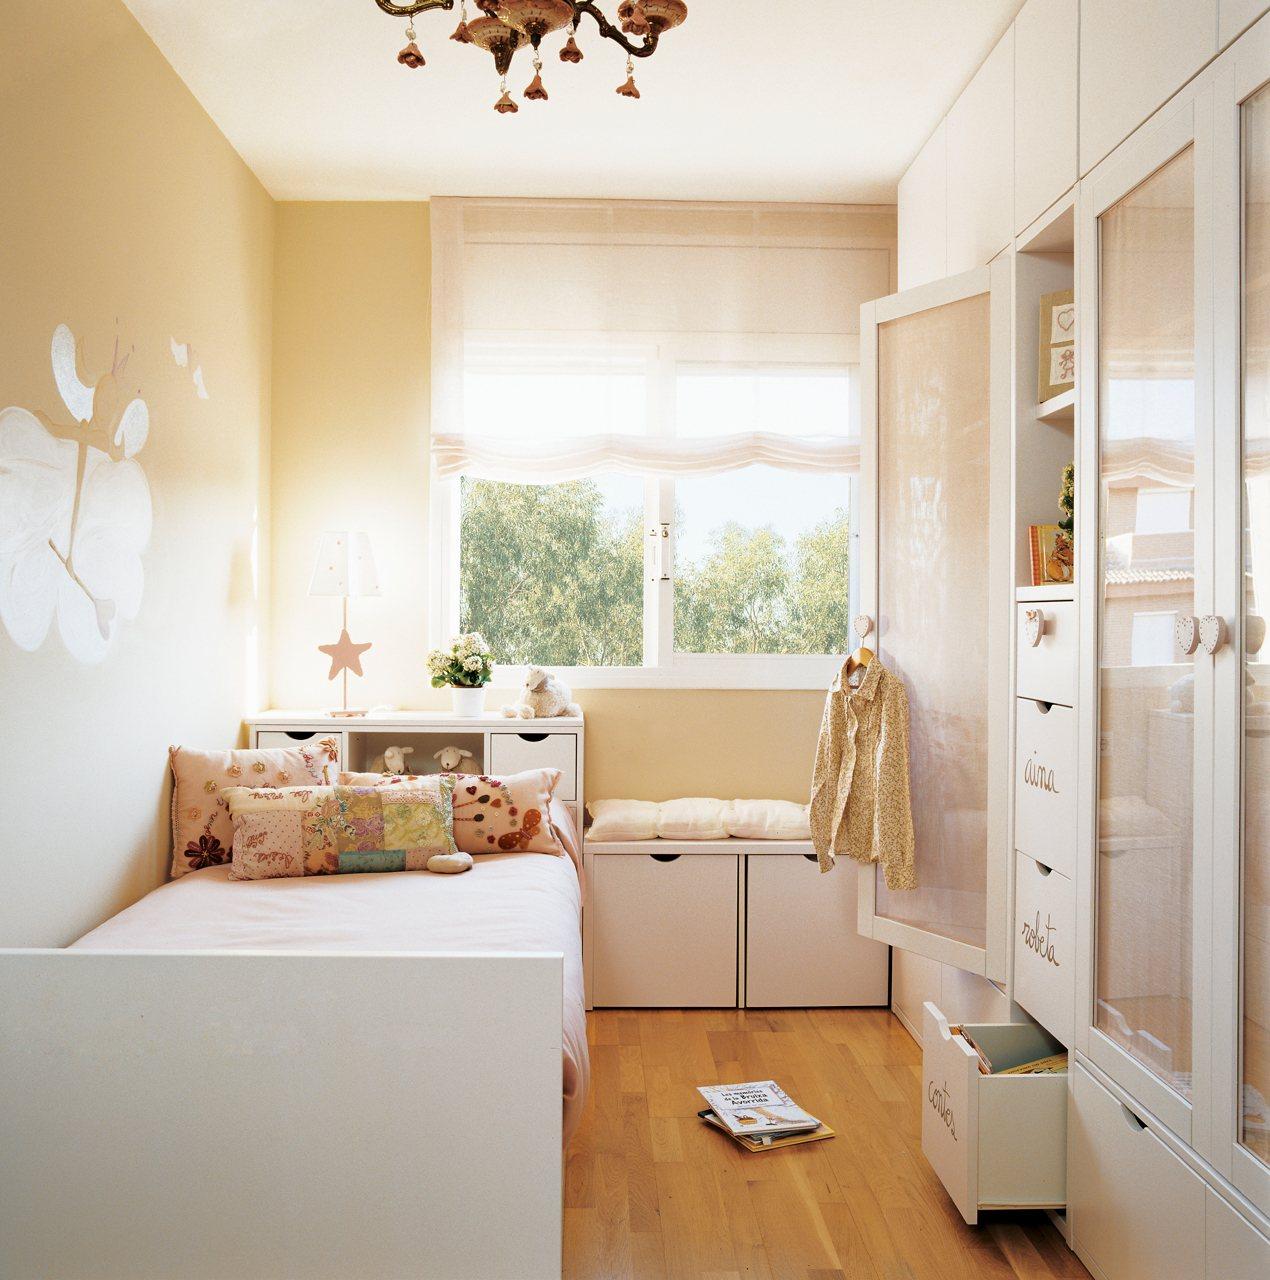 Dormitorios infantiles peque os s cales partido for Lenceria de dormitorio 3